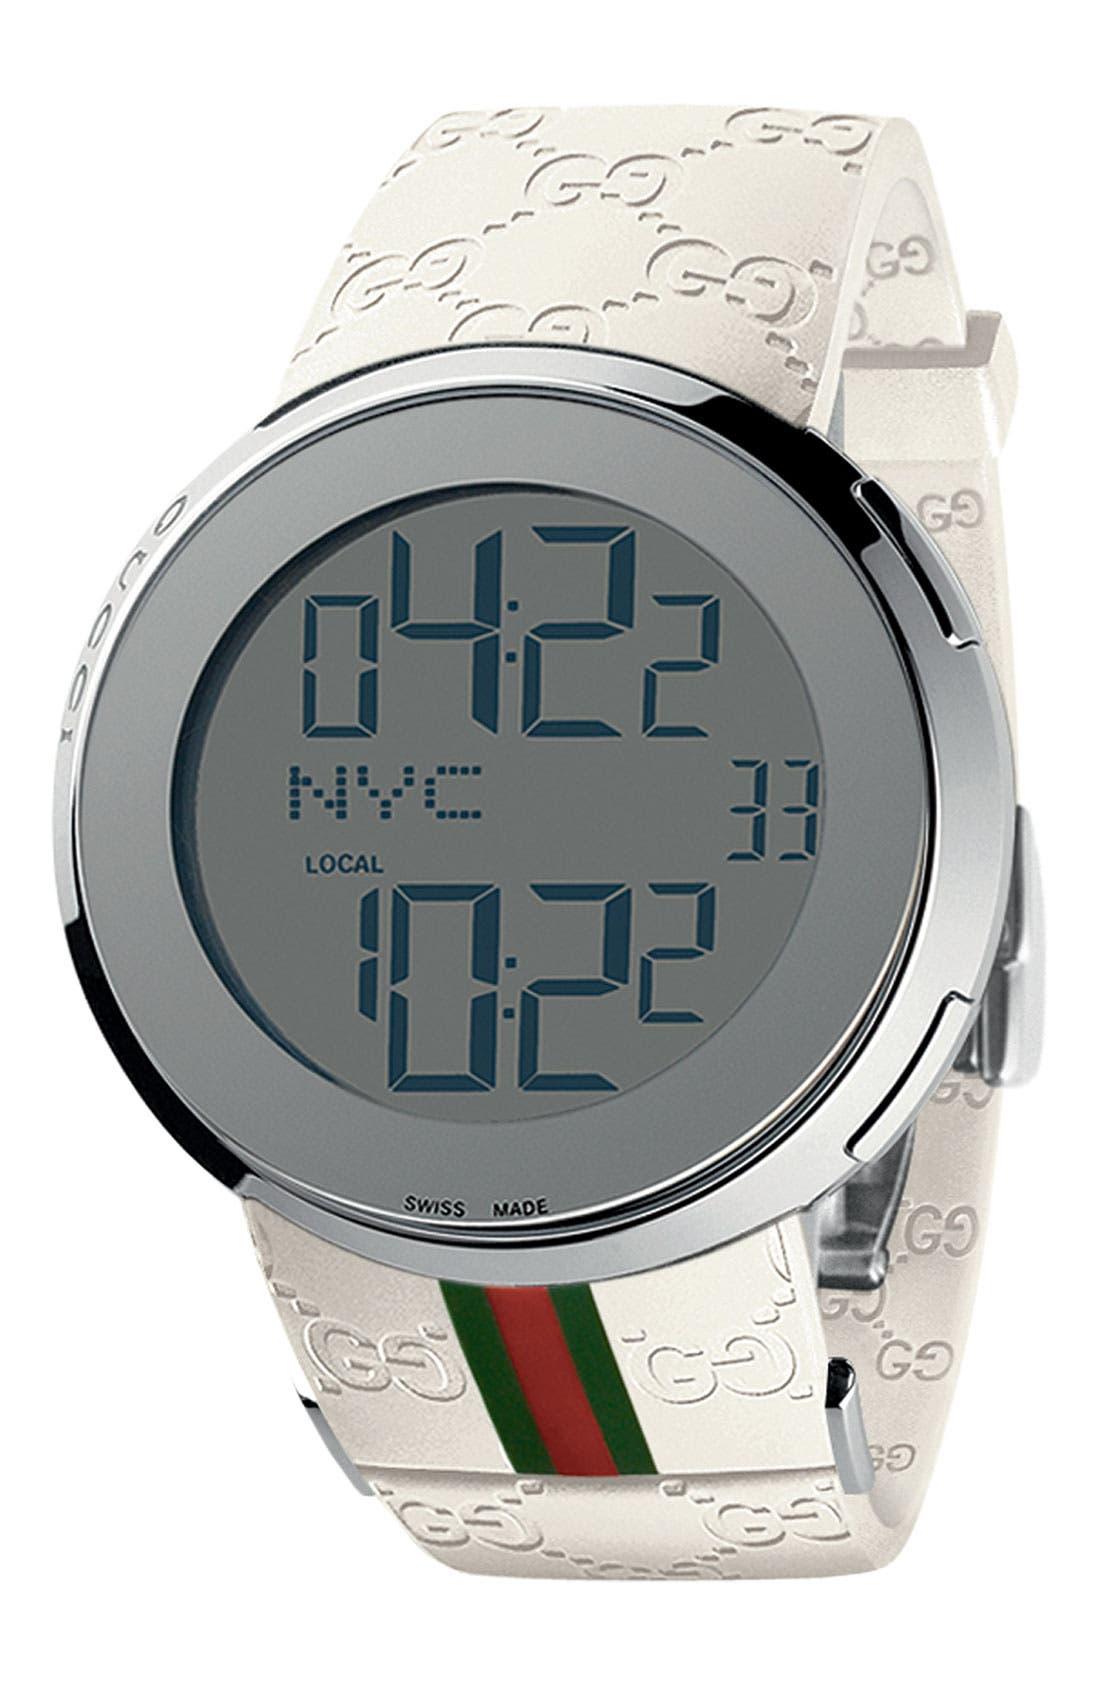 Main Image - Gucci Digital Watch, 44mm